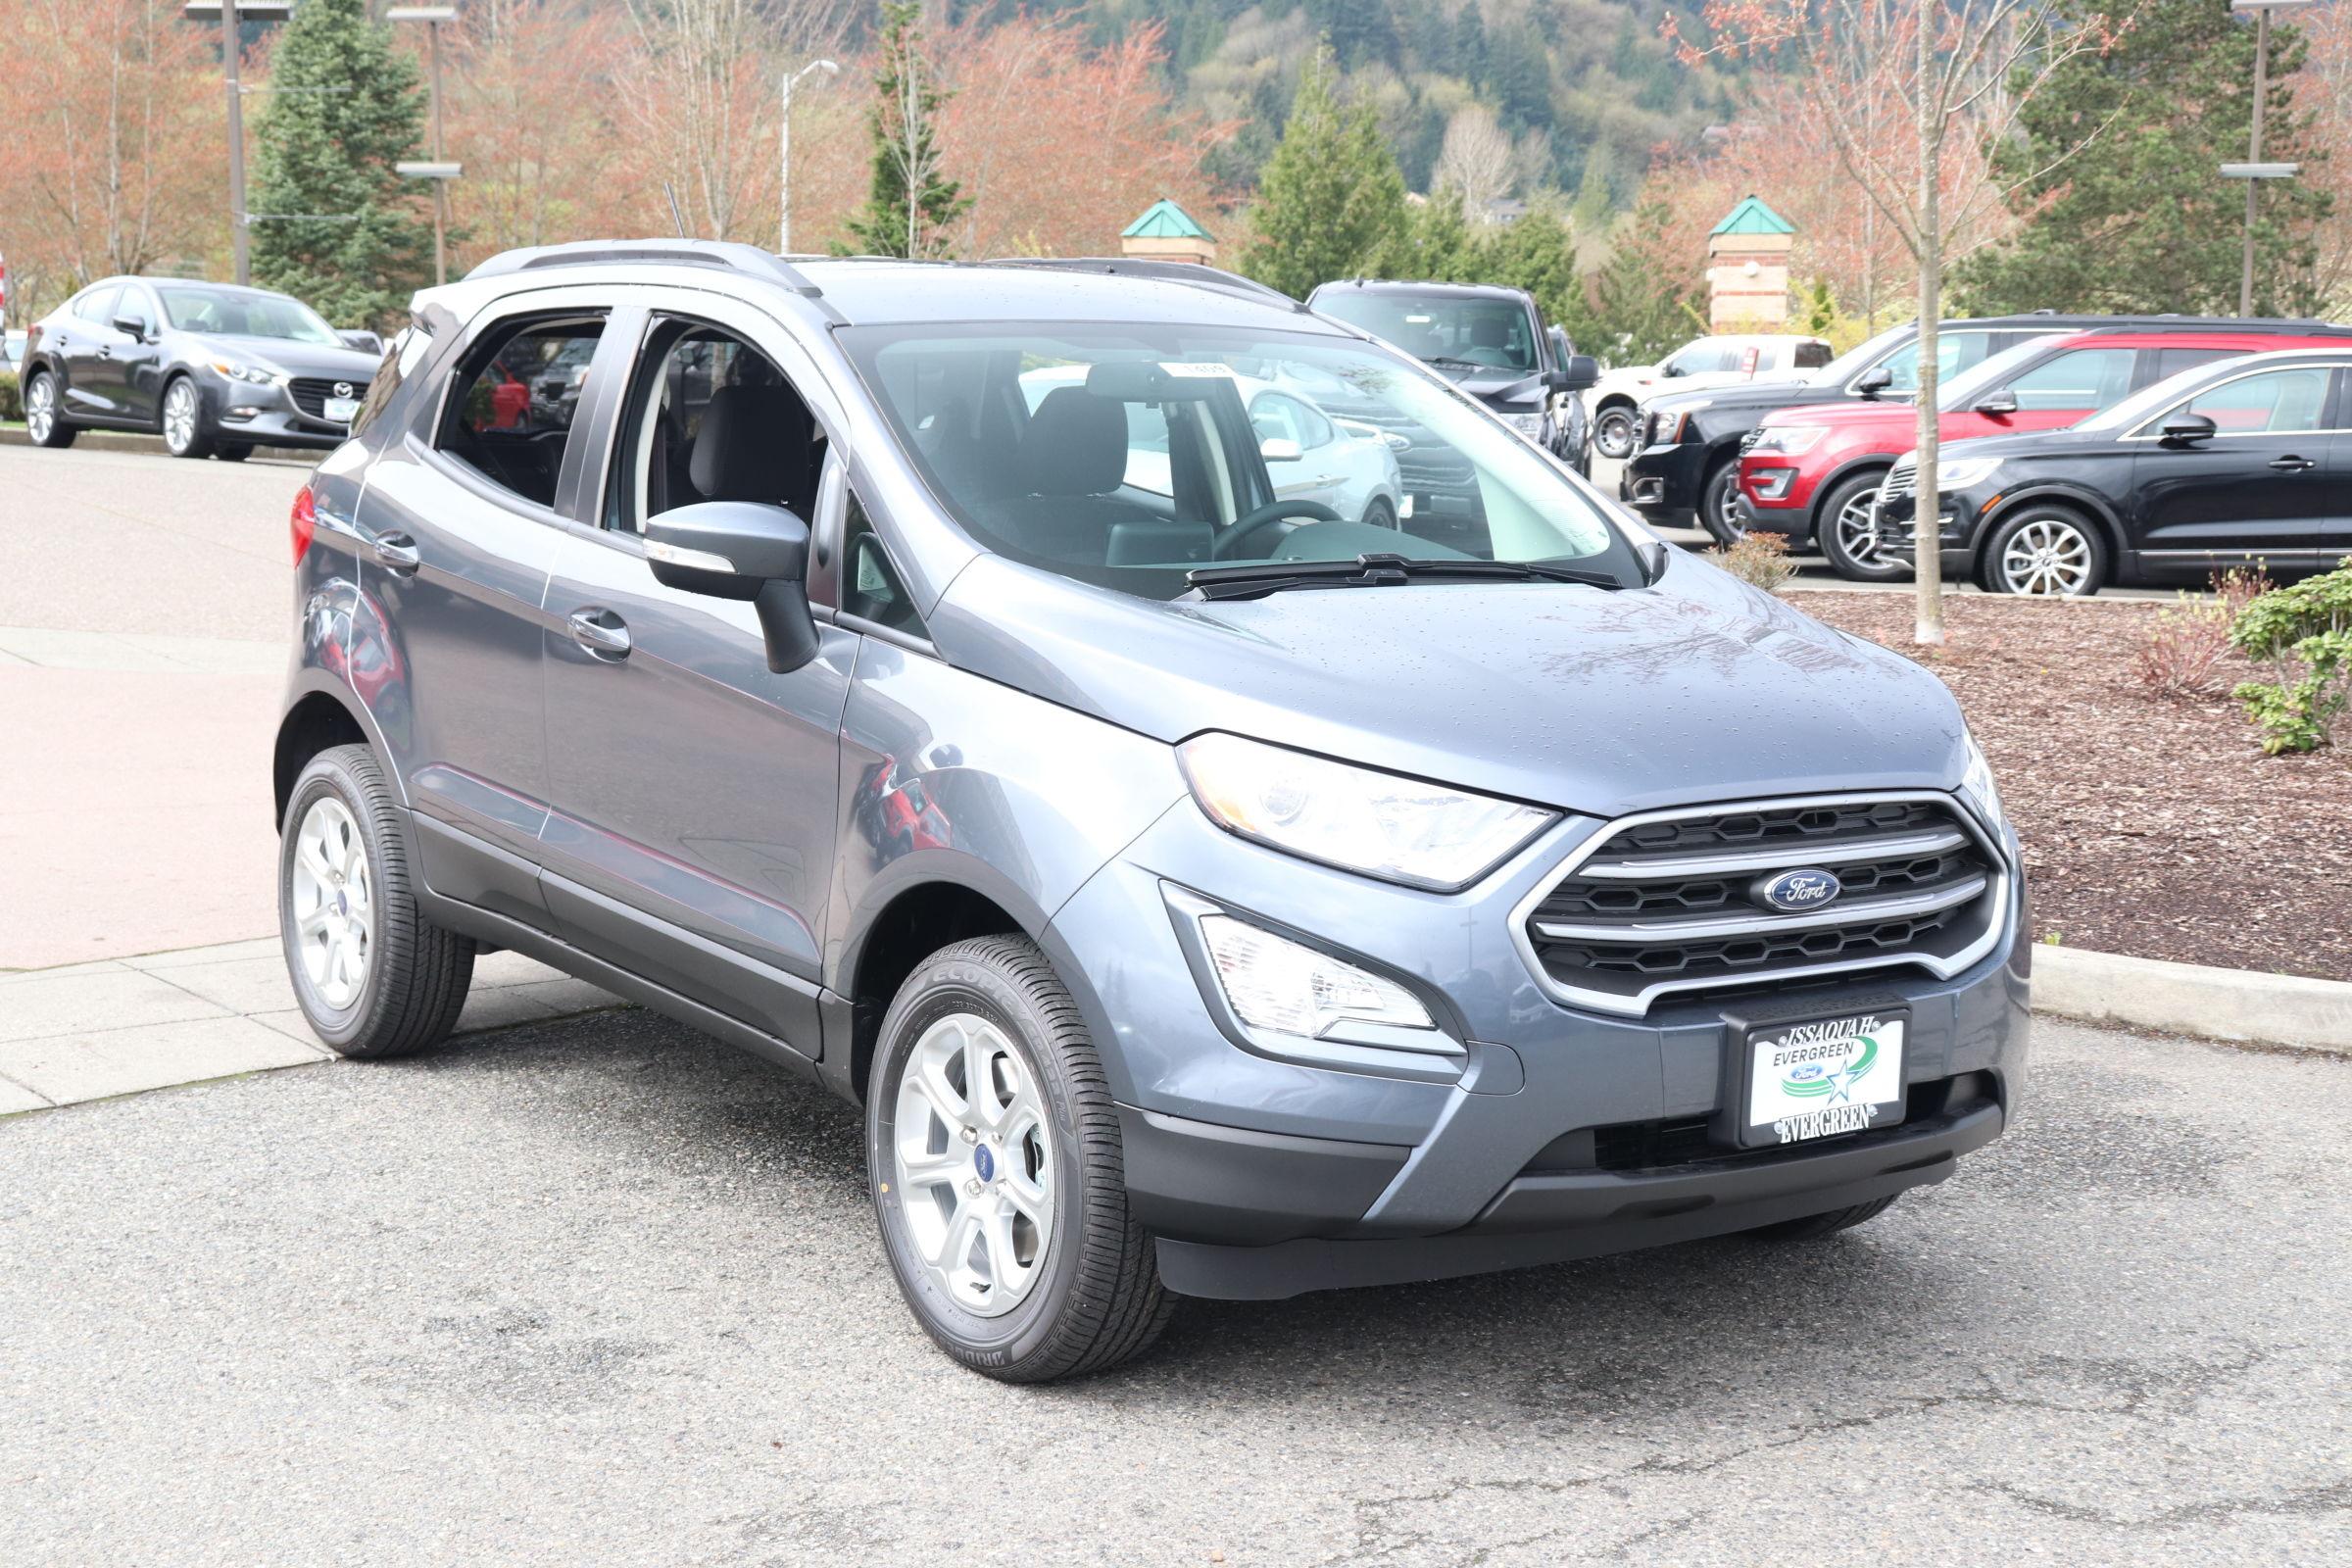 2019 Ford SUVs for Sale near Bellevue